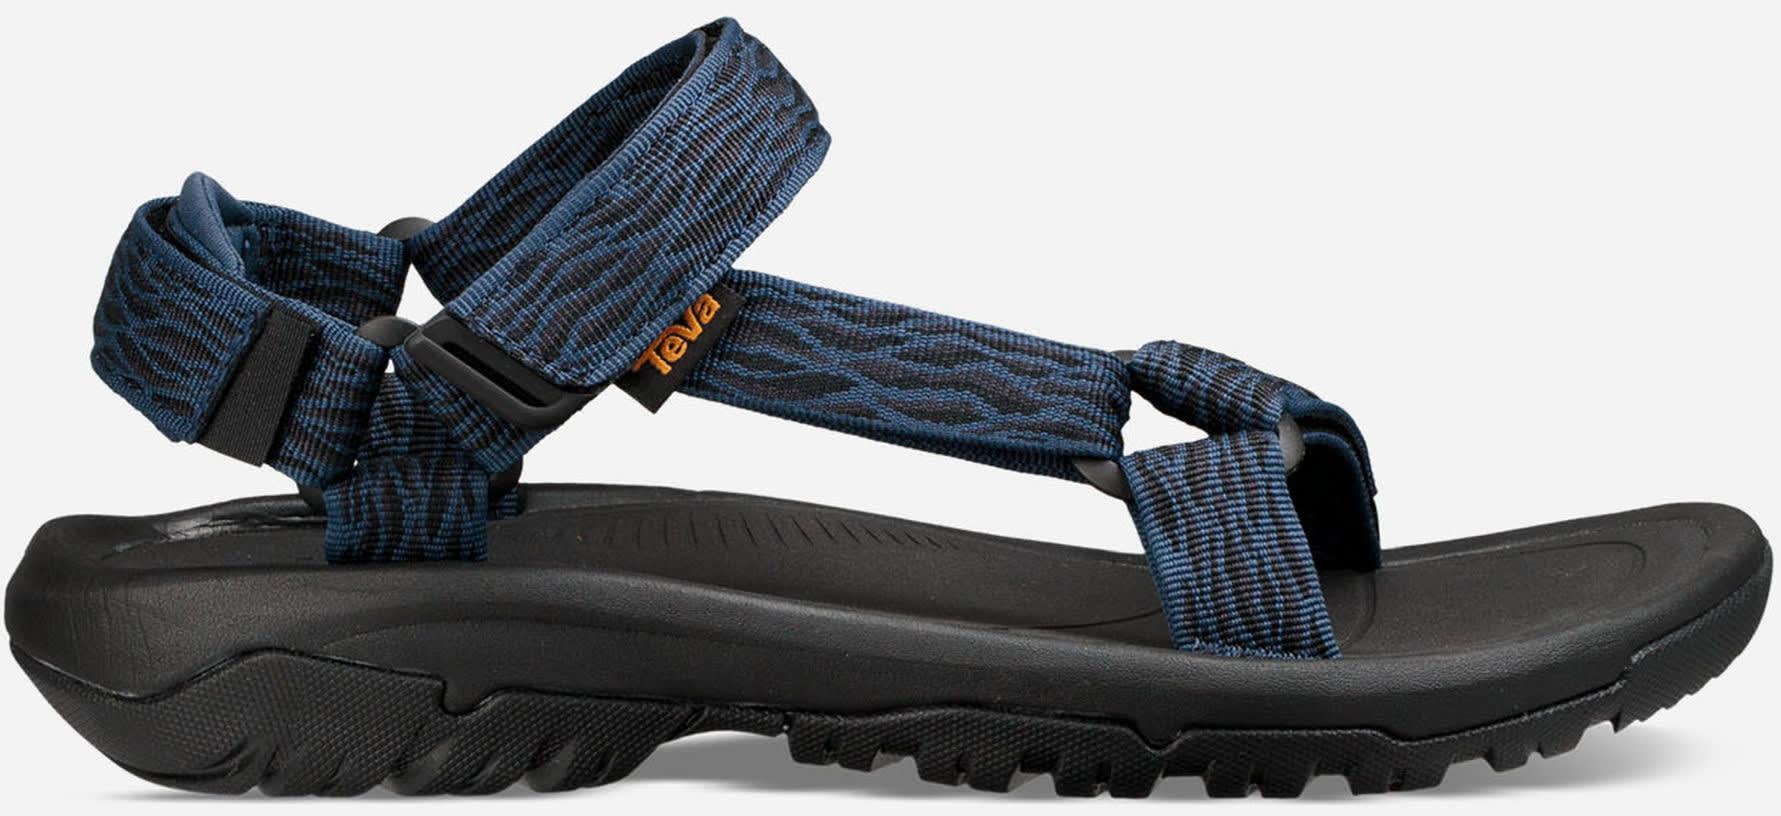 2d06b6489 Teva-Hurricane-XLT2-Sandals-Mens thumbnail 12